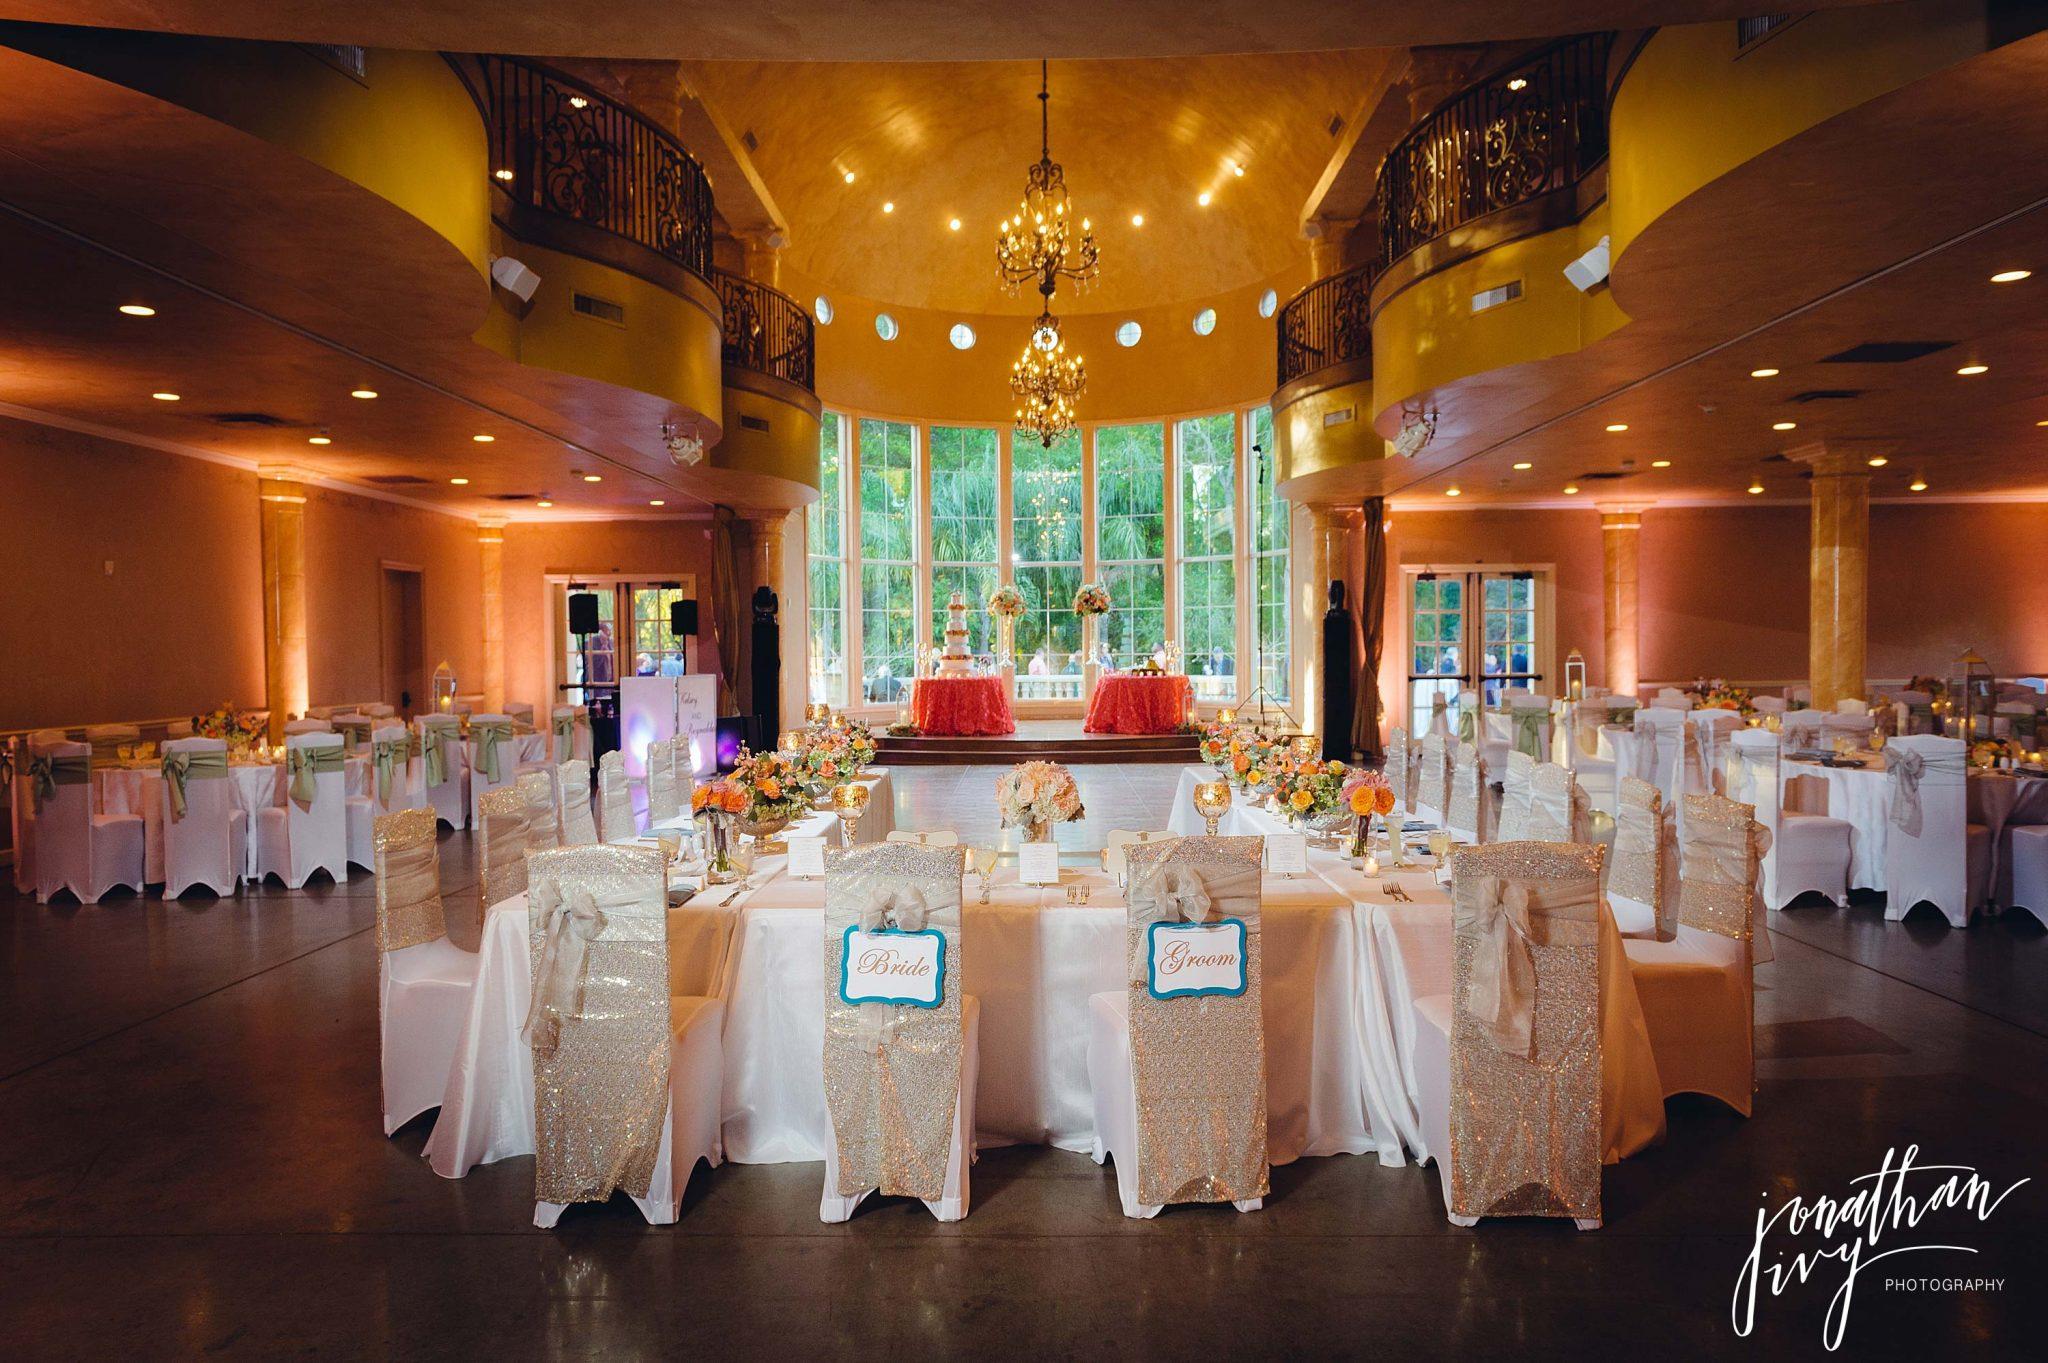 Chateau-polonez-wedding-houston_0032